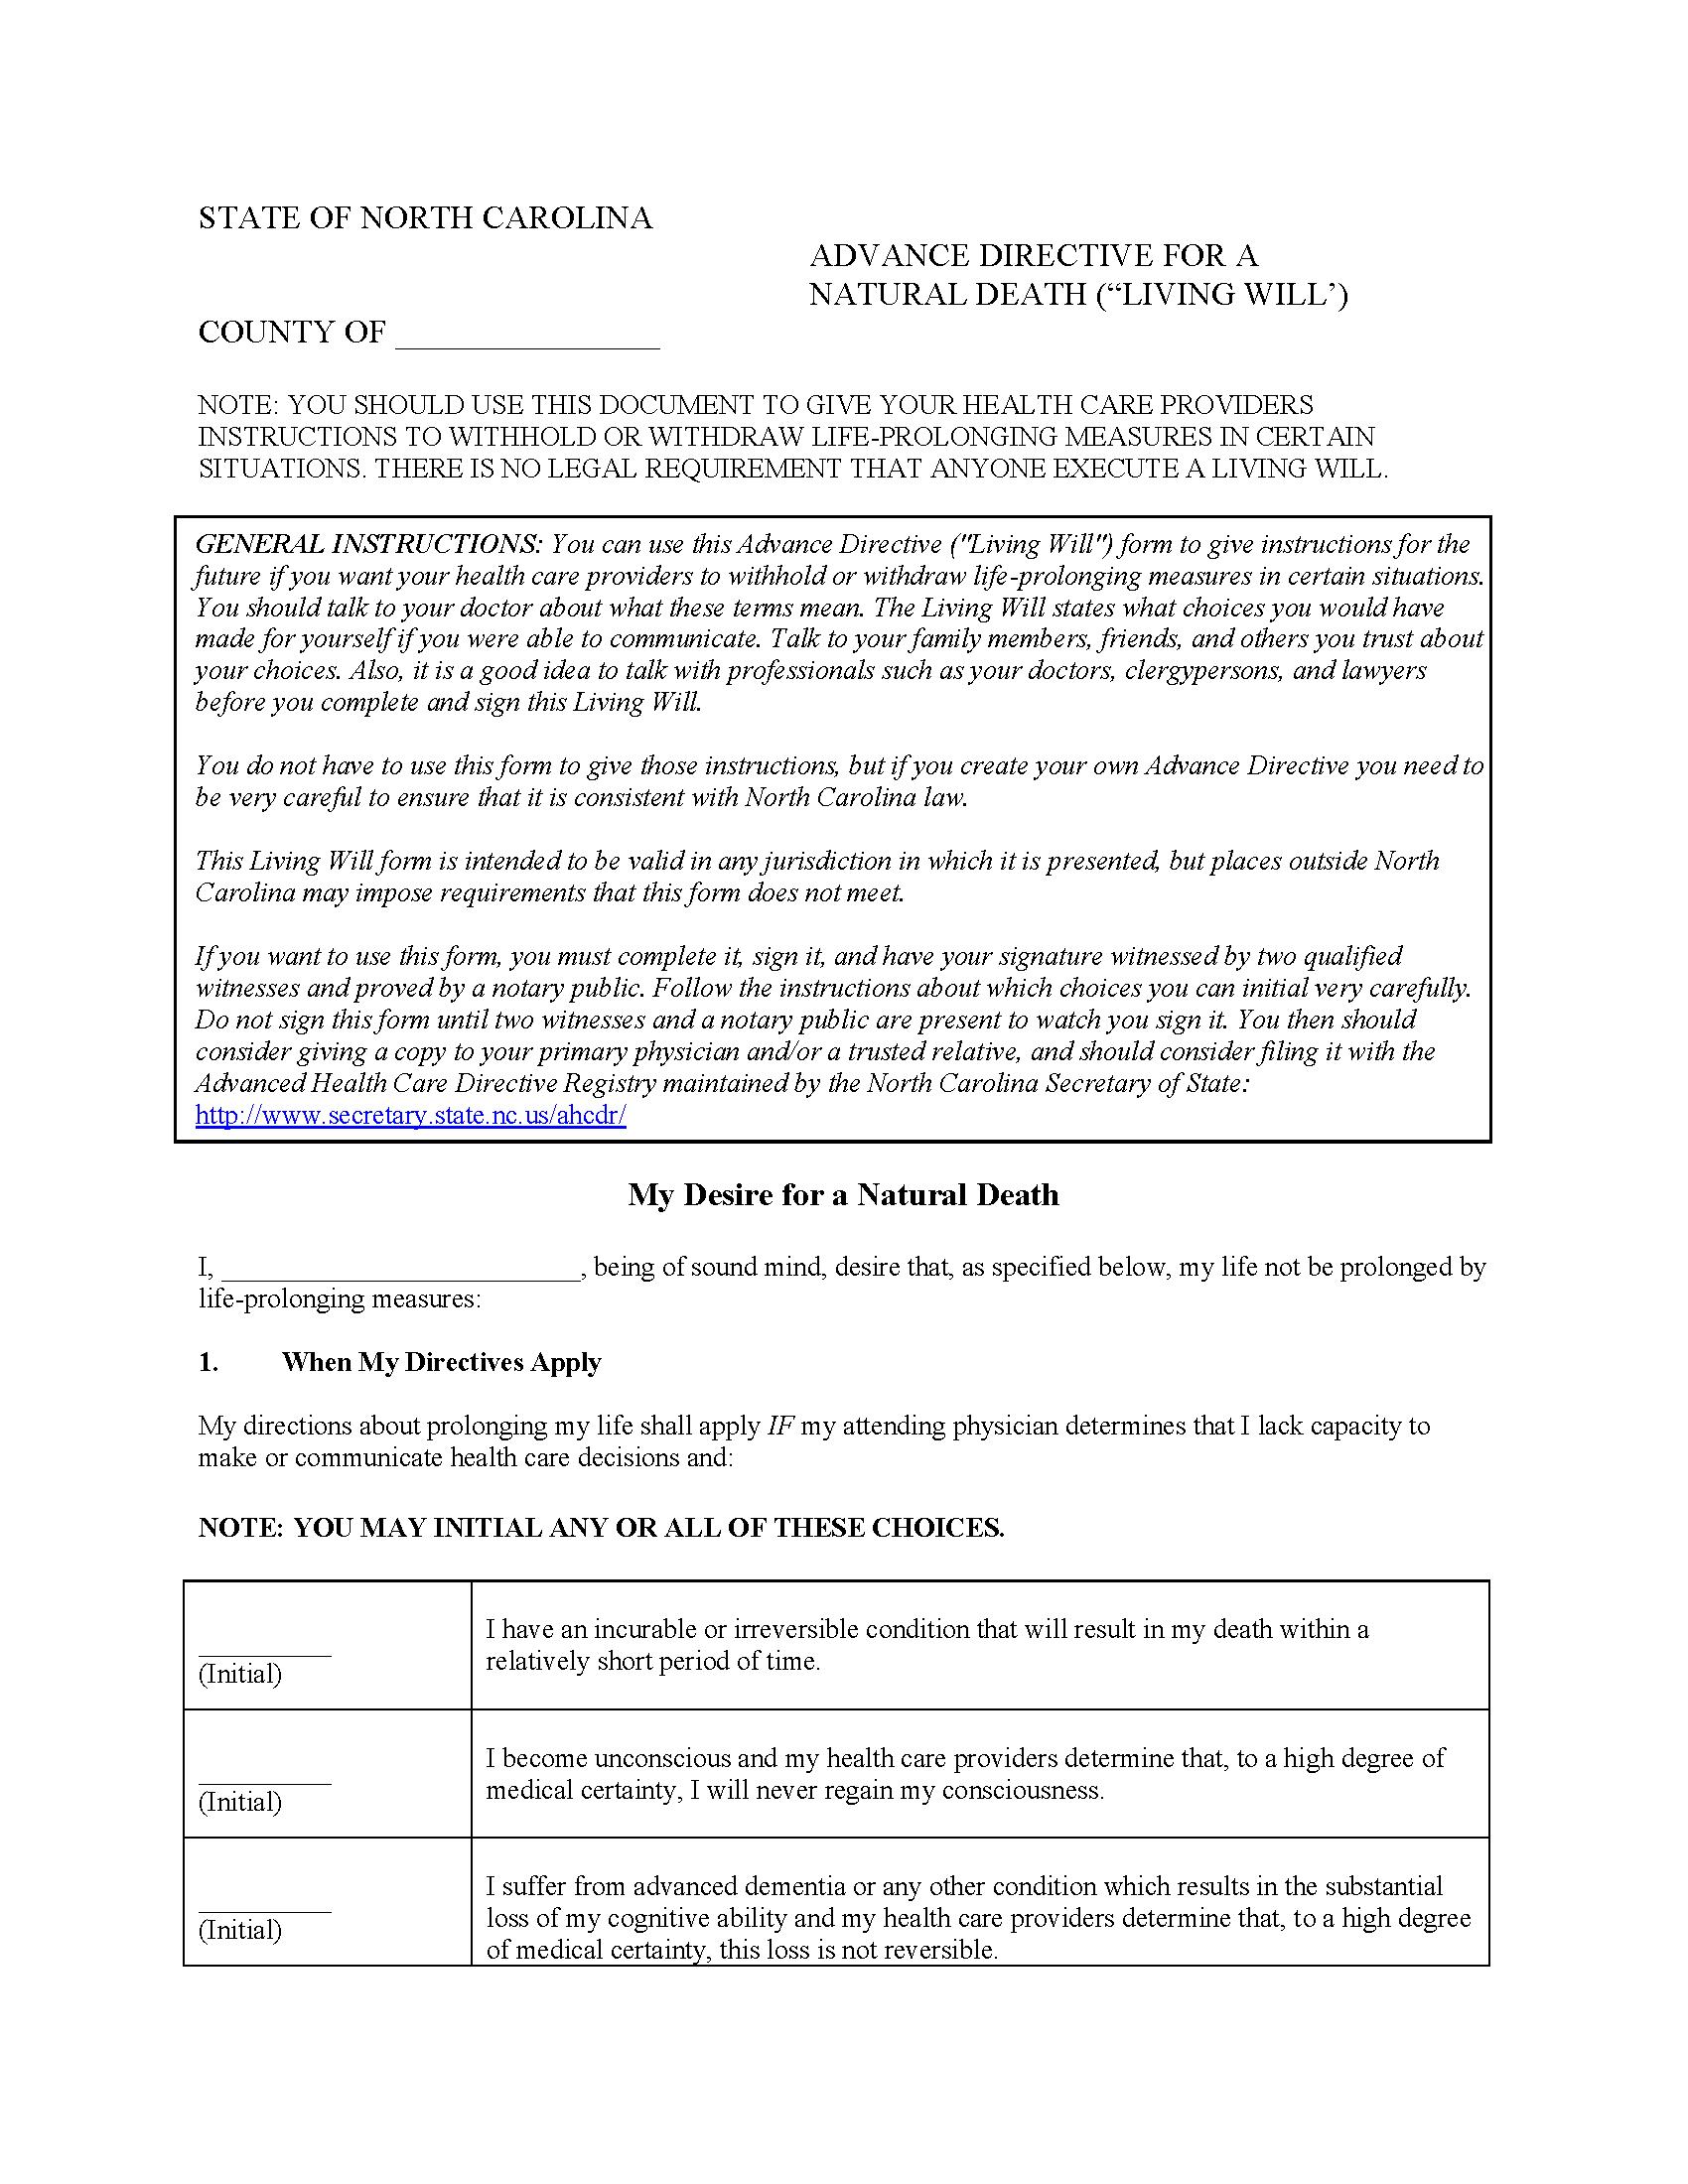 North Carolina Living Will Form Fillable PDF Free